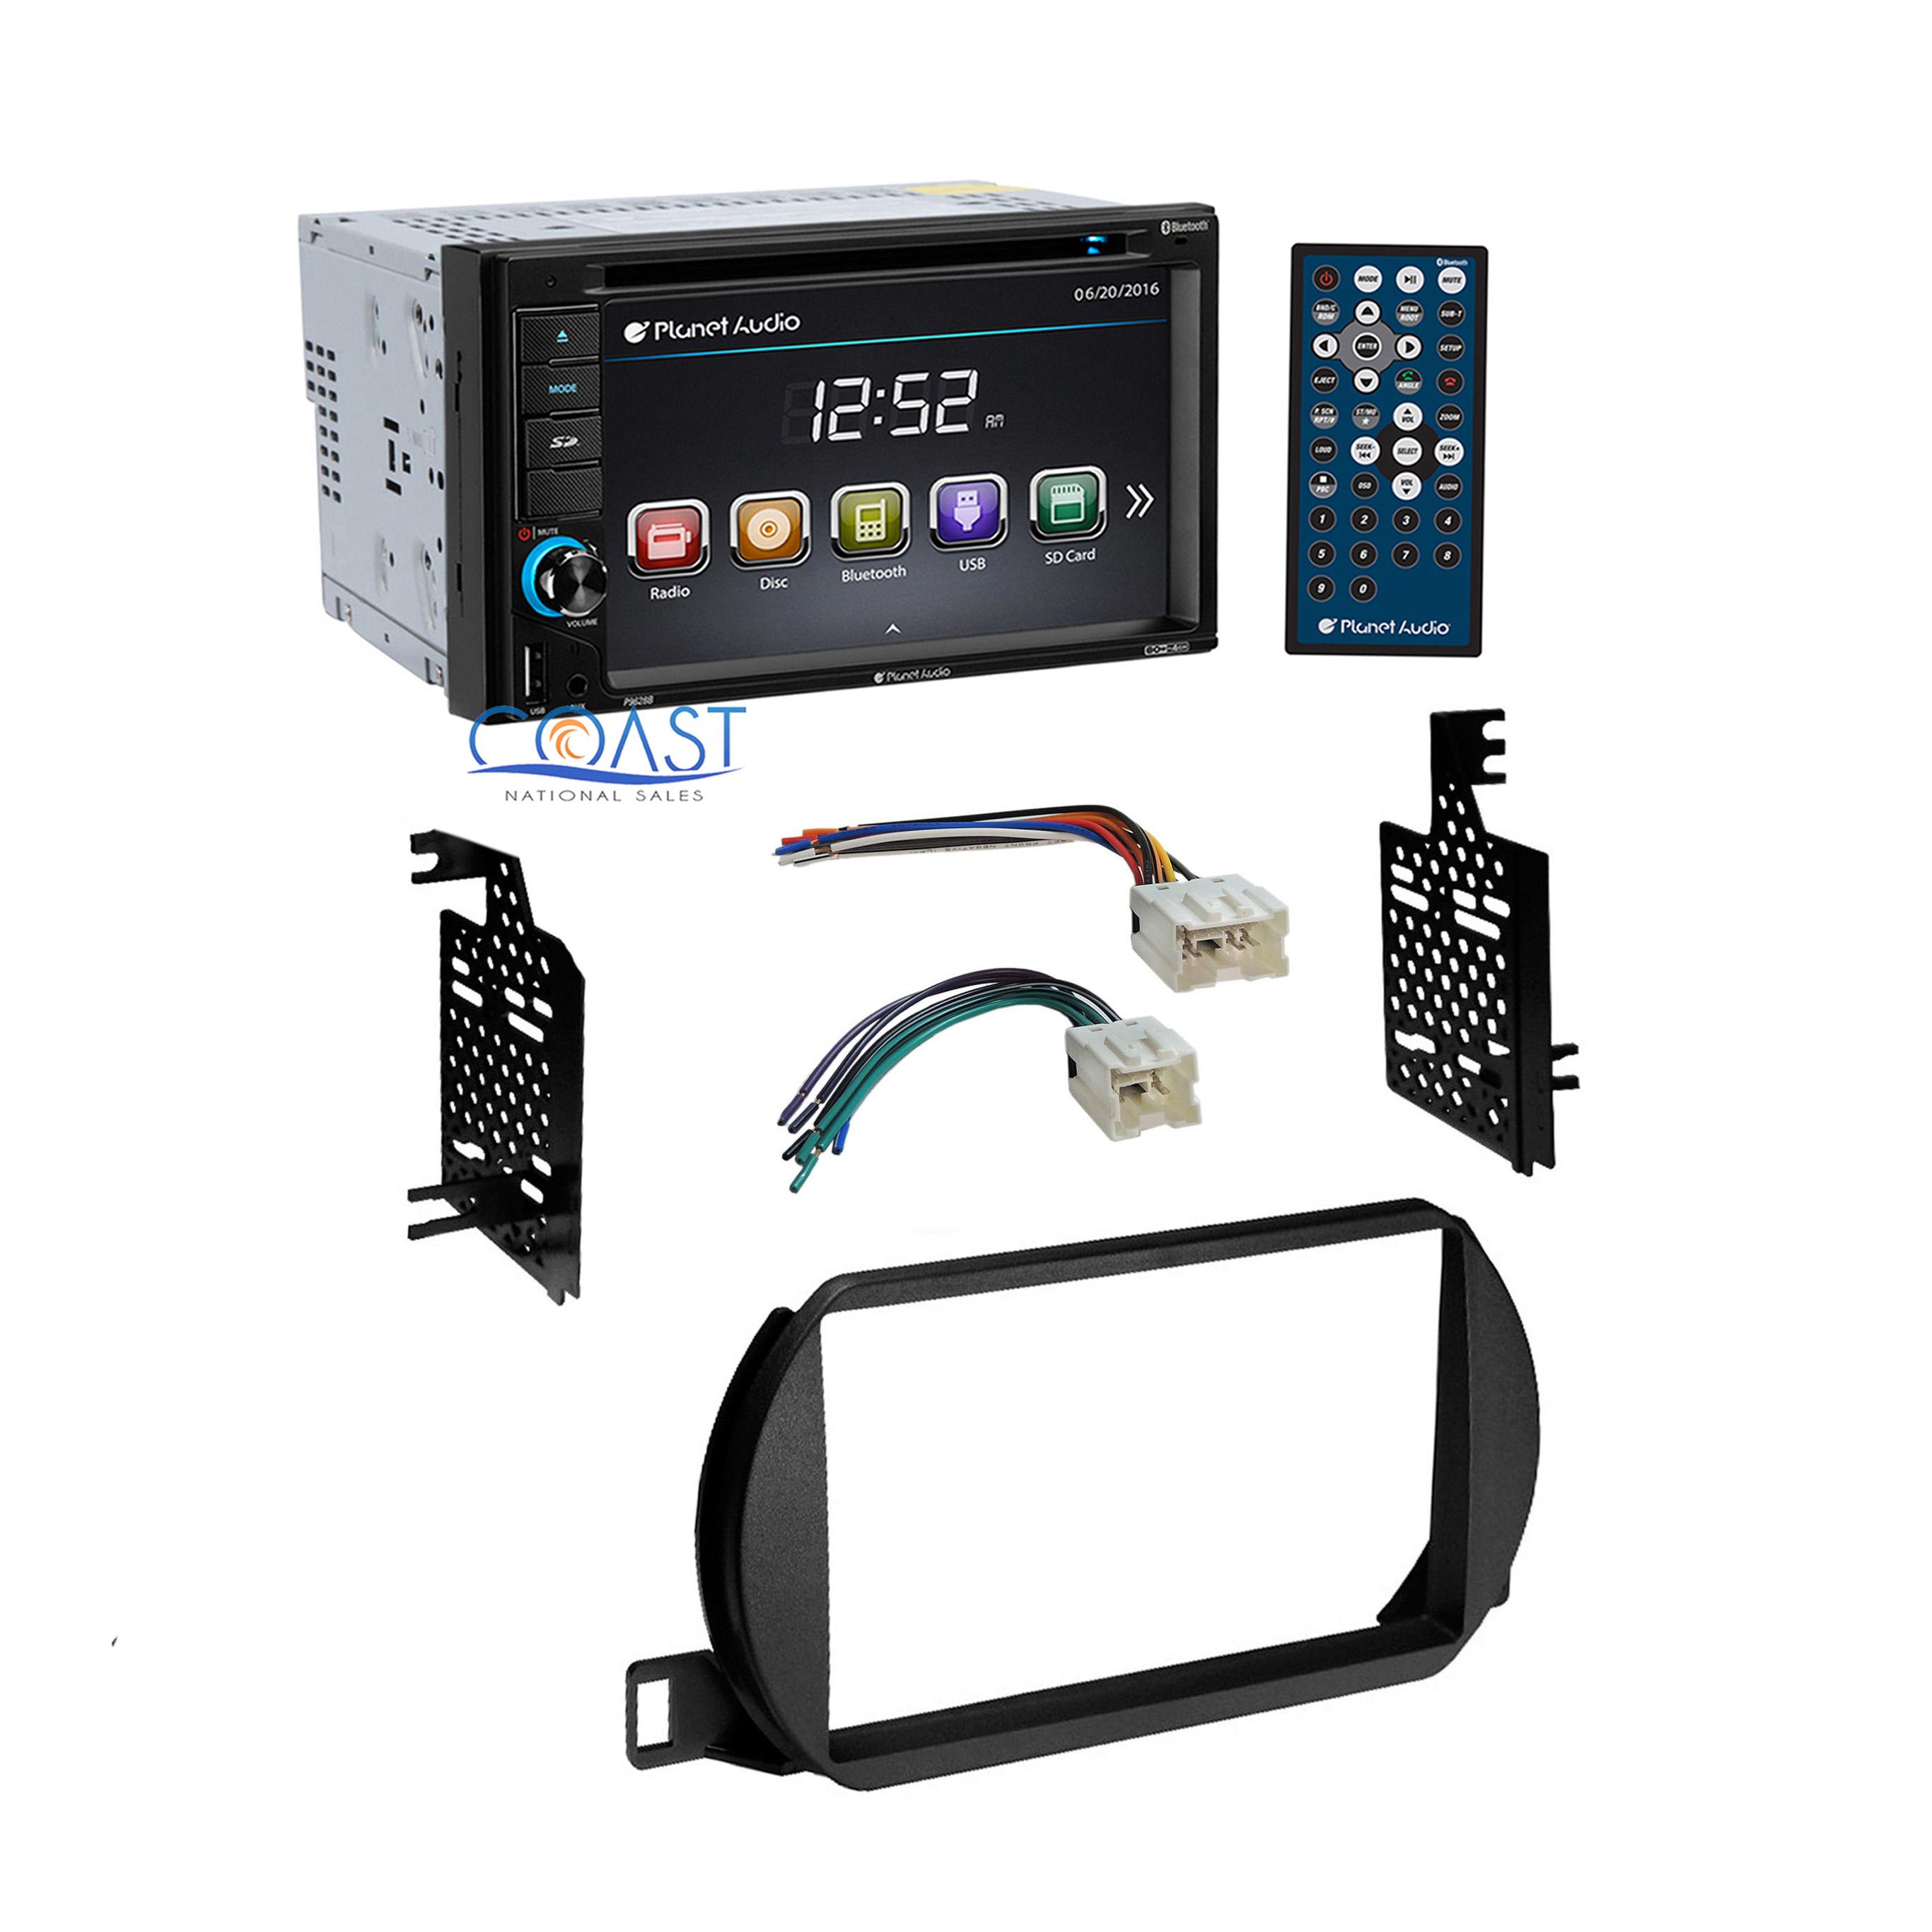 Radio Wiring Harness 2002 Nissan Altima Radio Kit Car Stereo Kits For